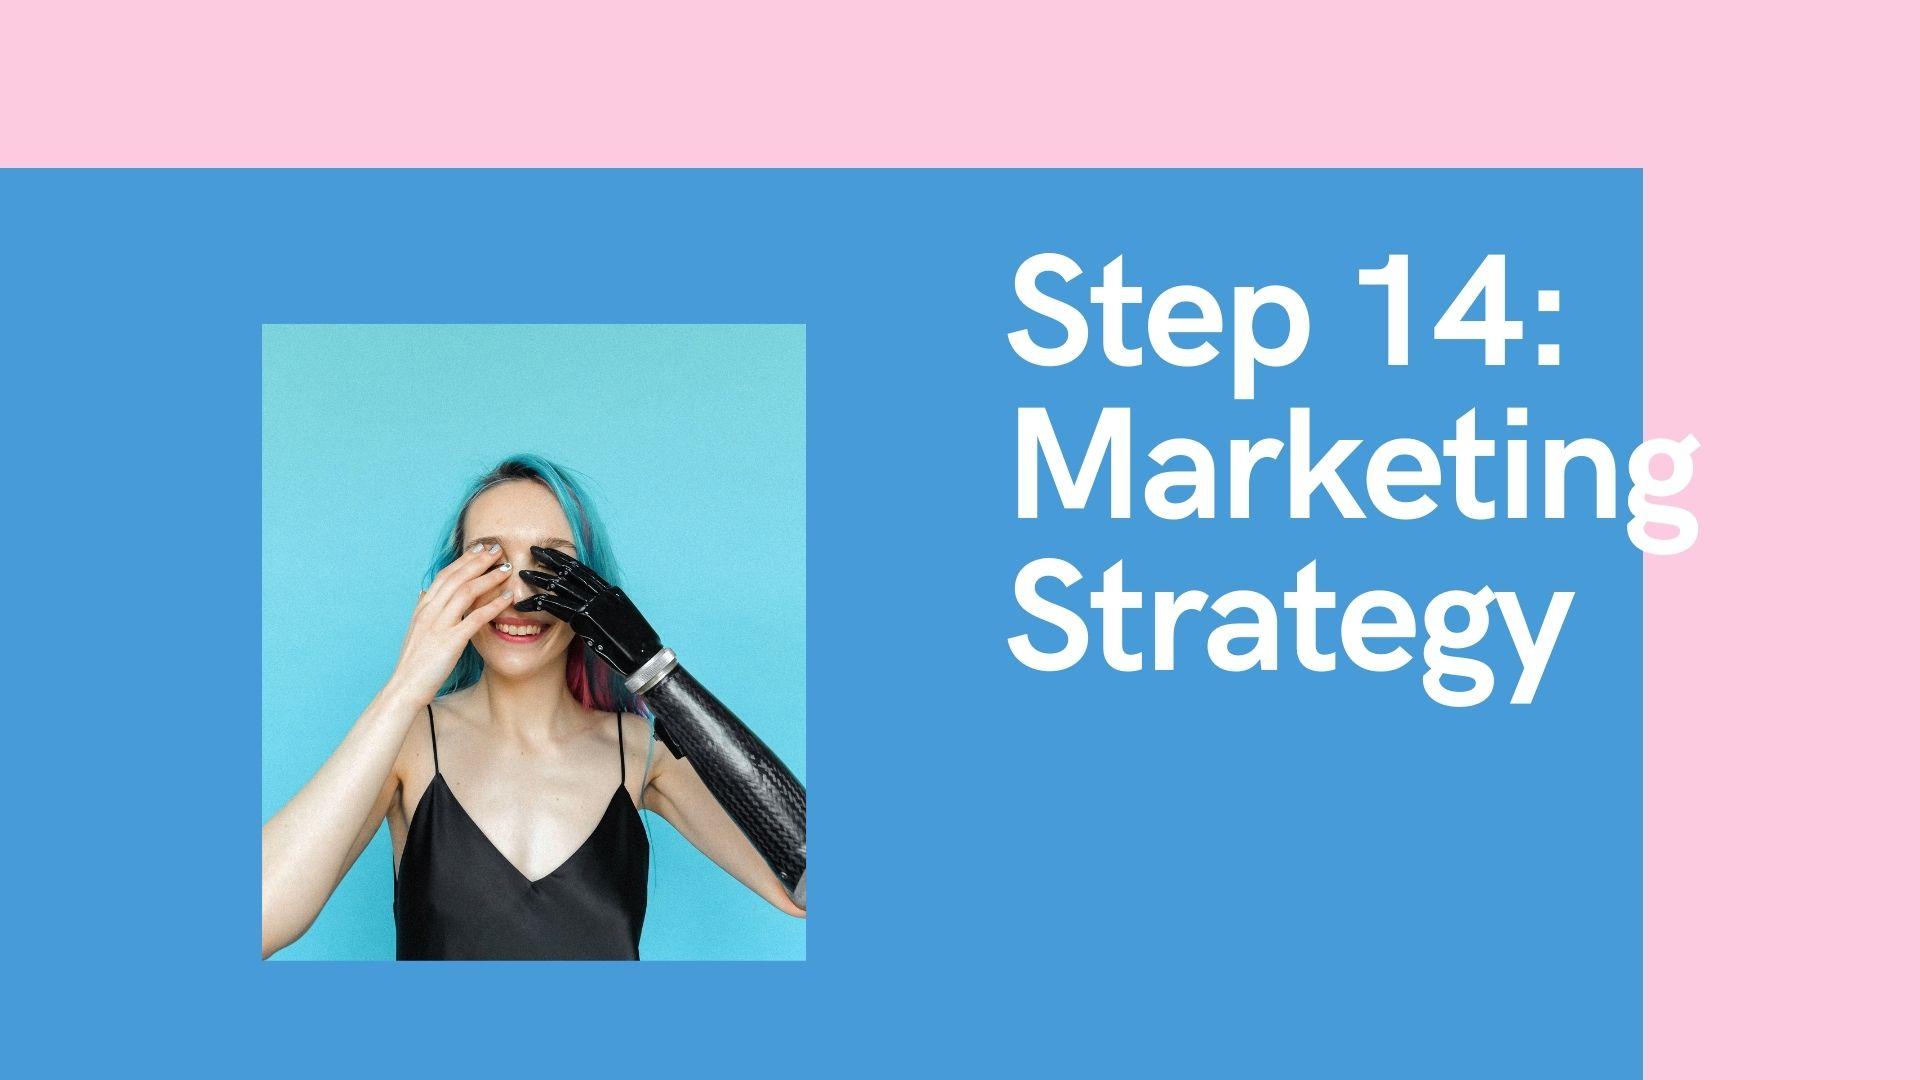 Step 14 Marketing Strategy